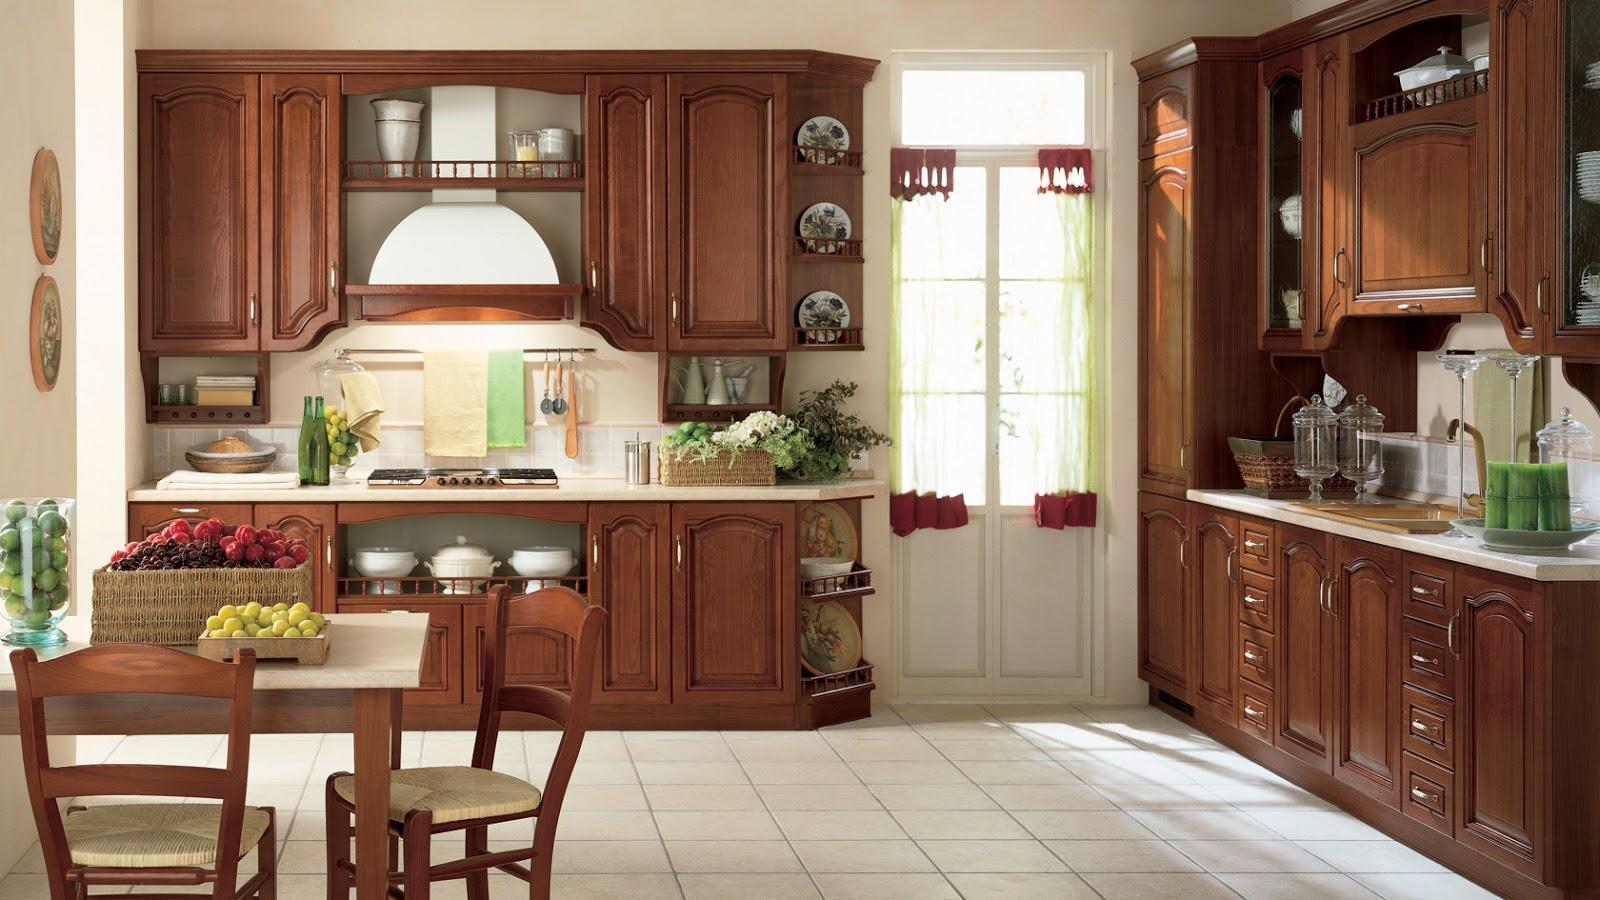 Cucine classiche for Cucine classiche